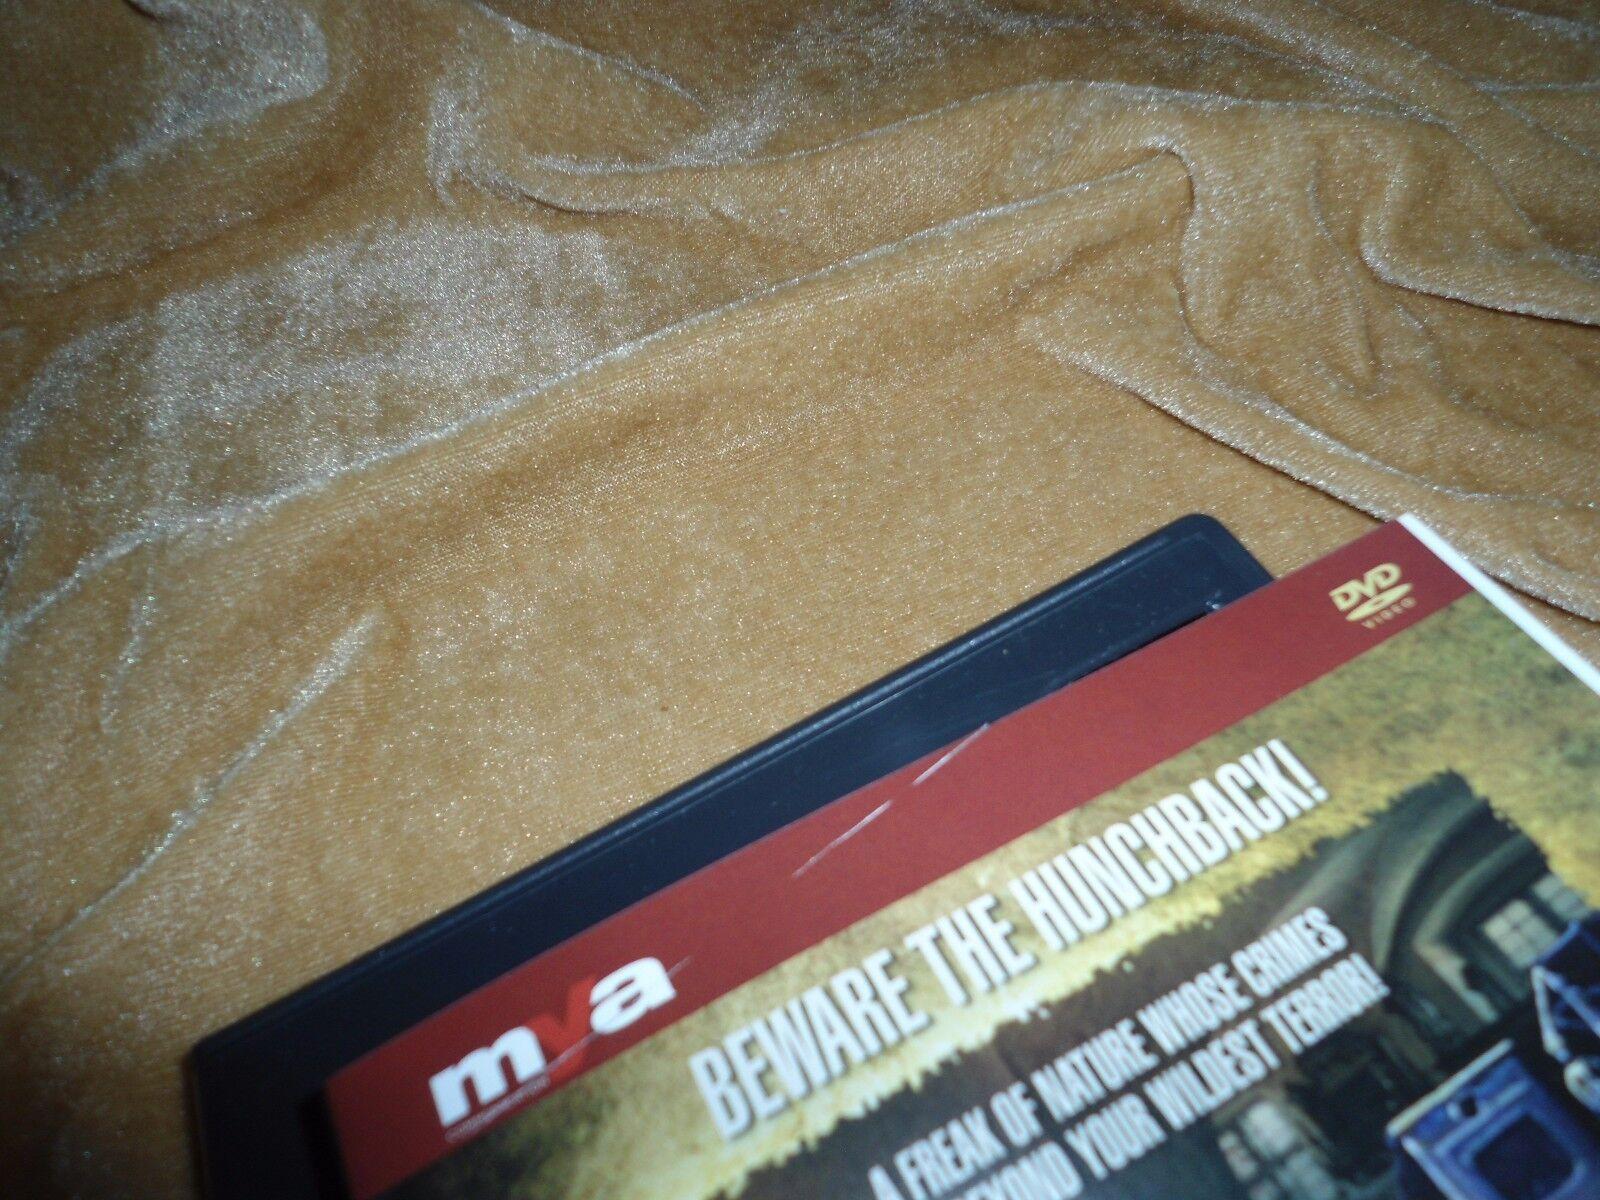 Hunchback Of The Morgue 1973 1 Disc DVD MYA COMMUNICATION STUDIO - $69.99